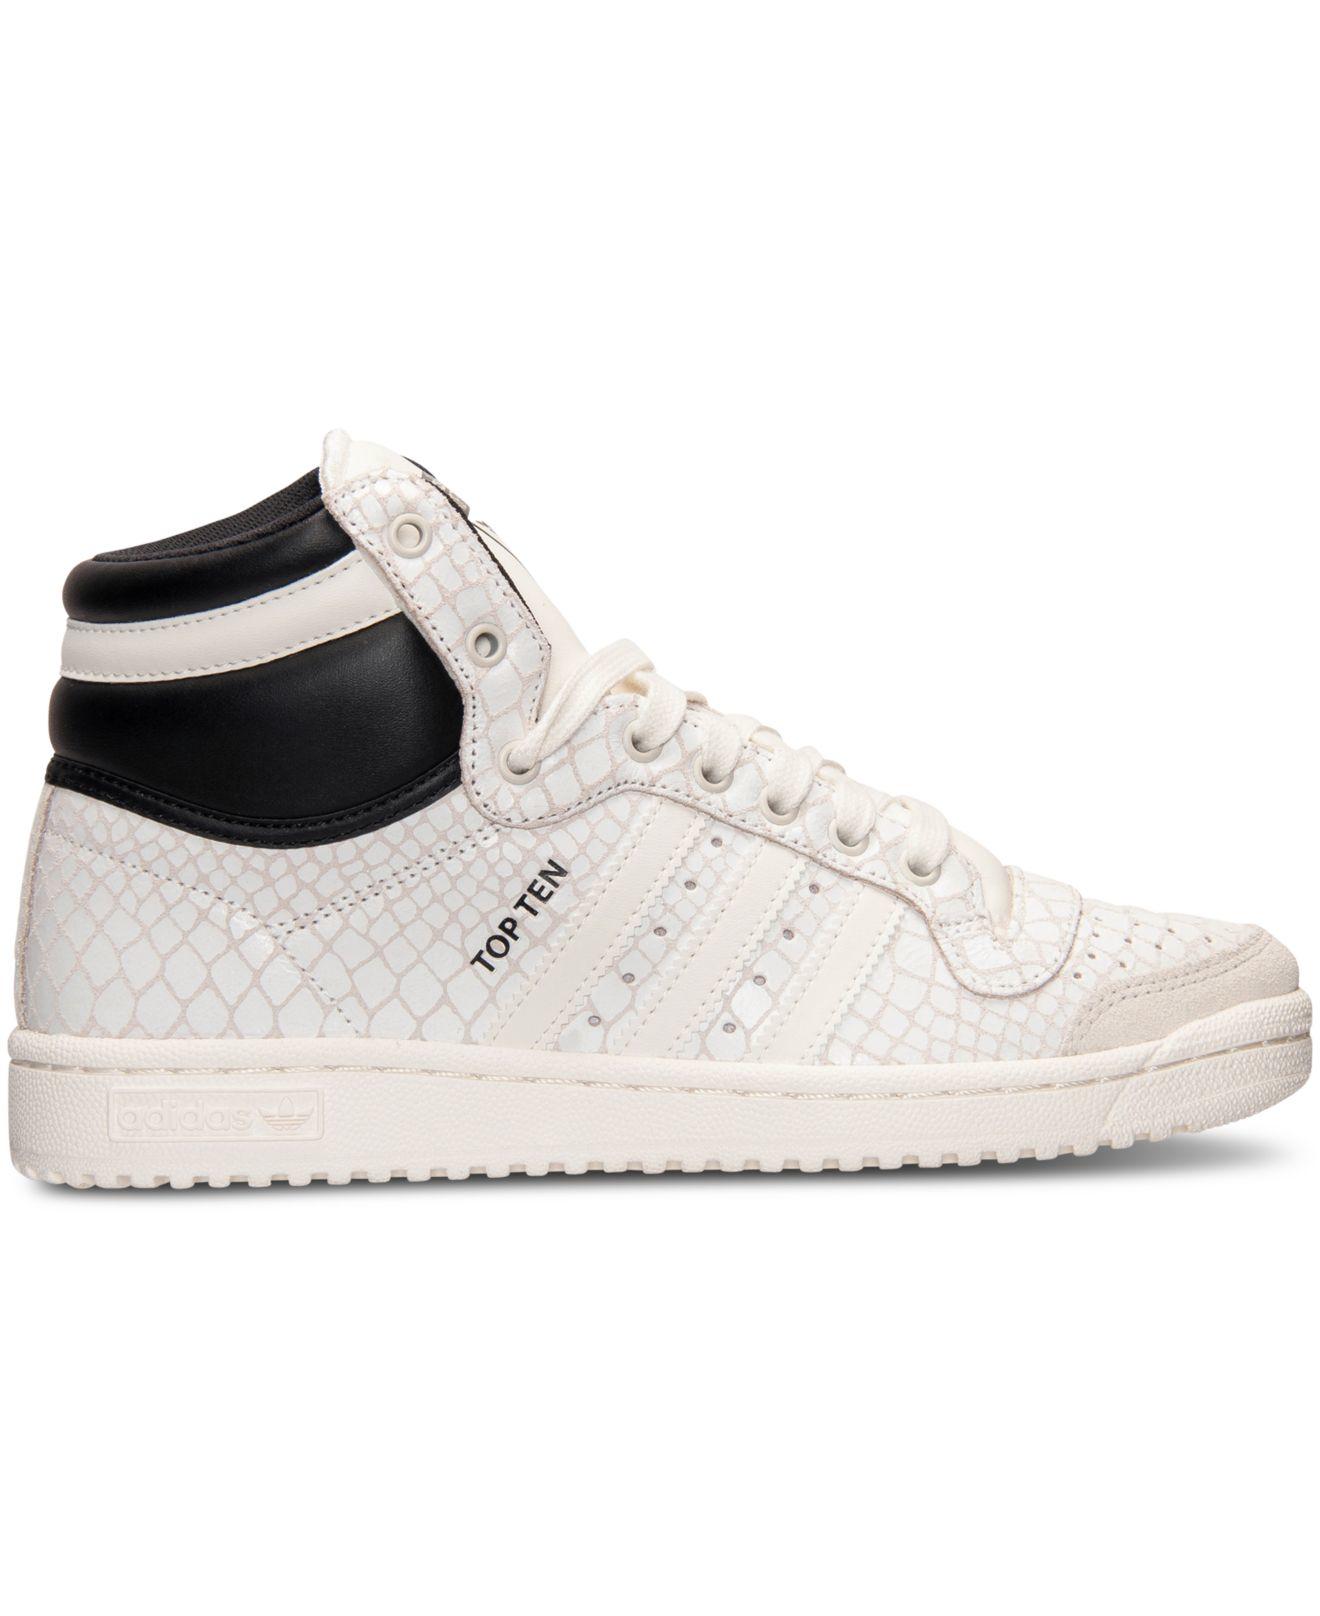 adidas originals s top ten hi casual sneakers from